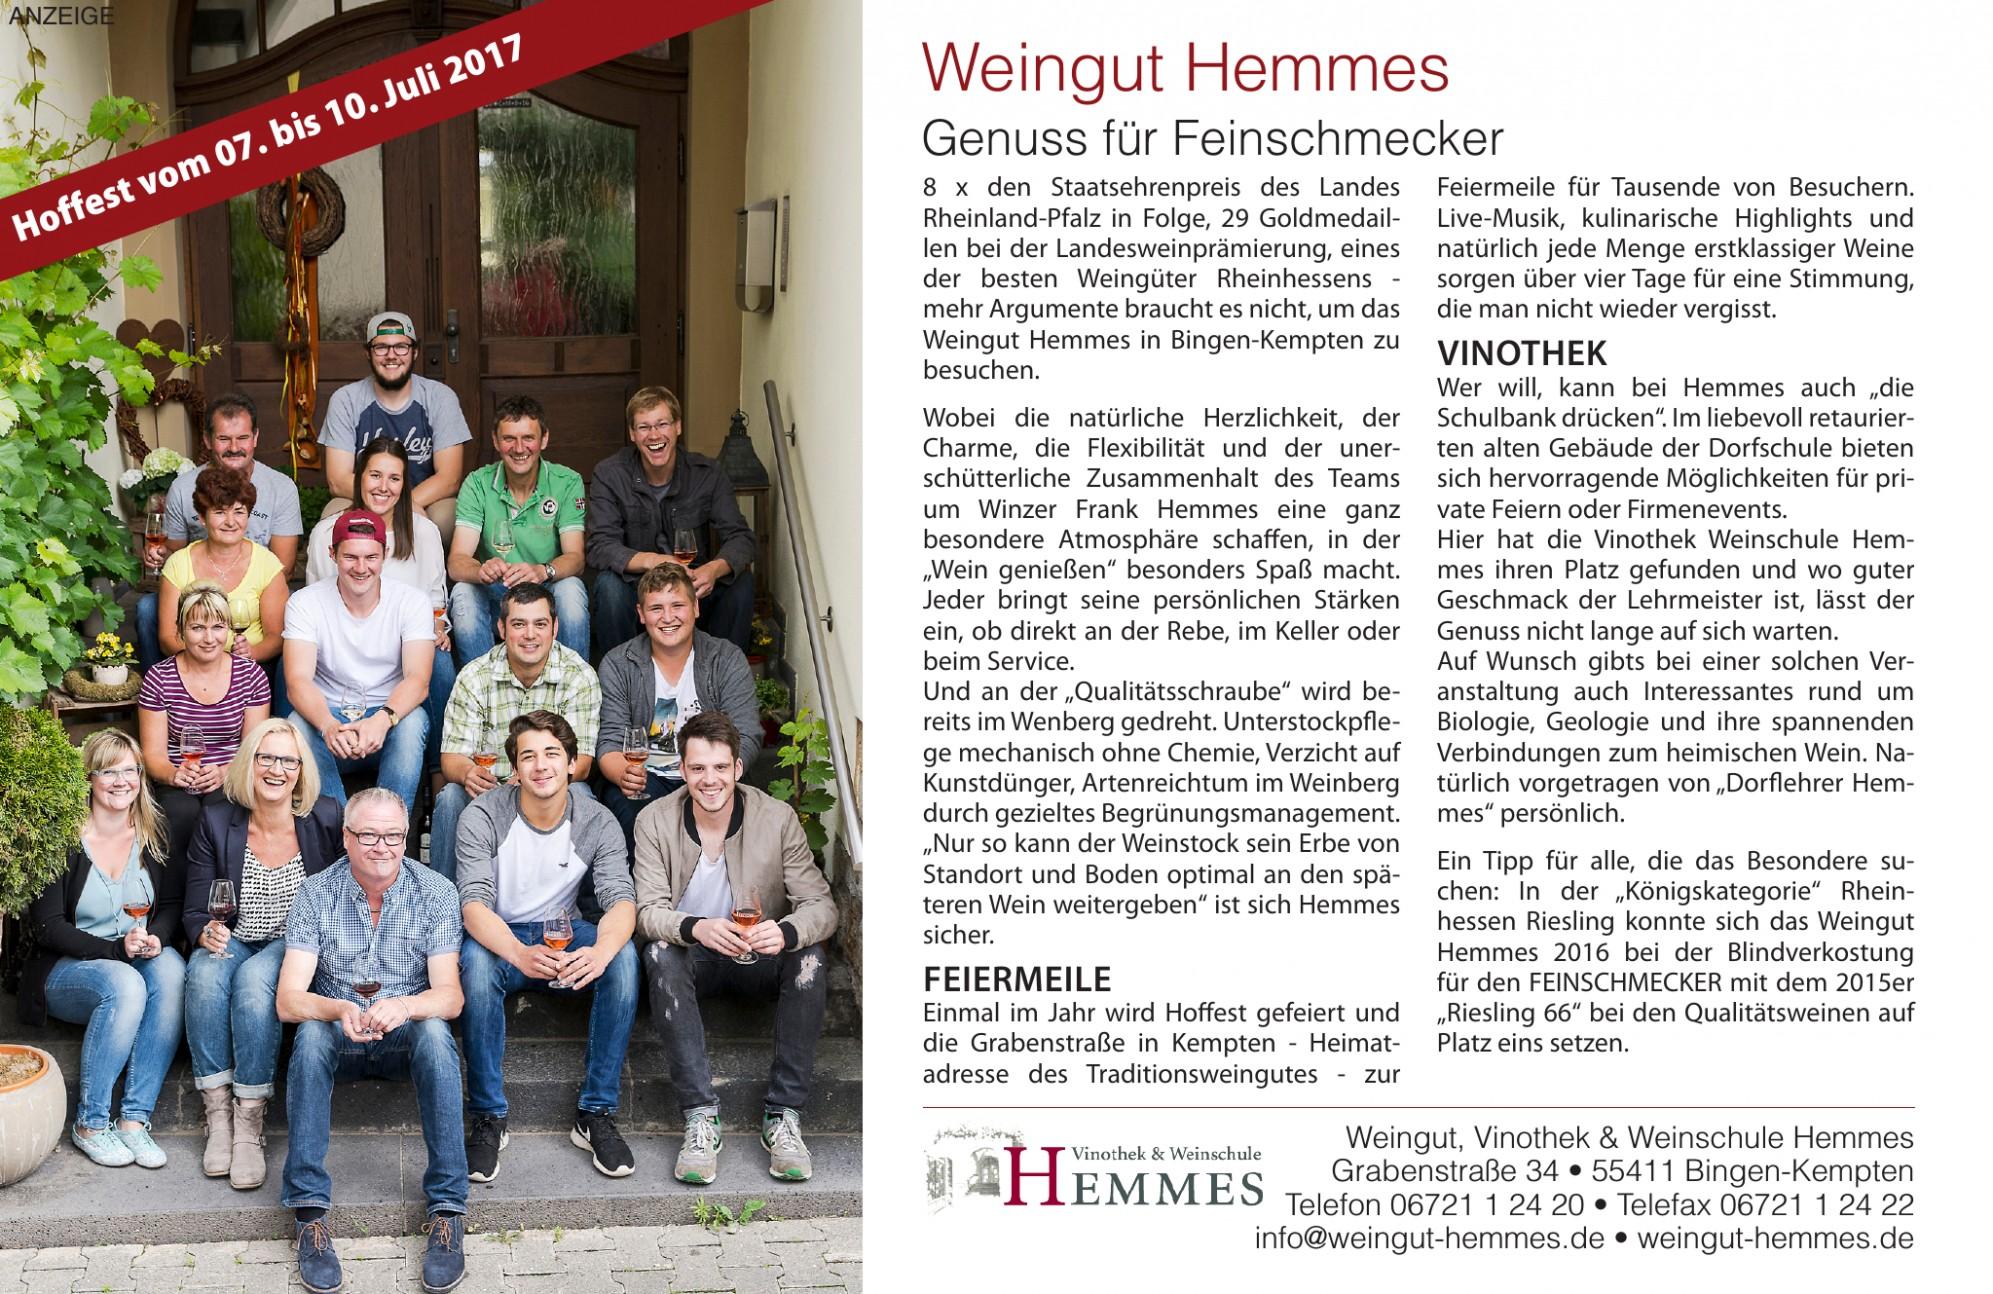 Weingut, Vinothek & Weinschule Hemmes